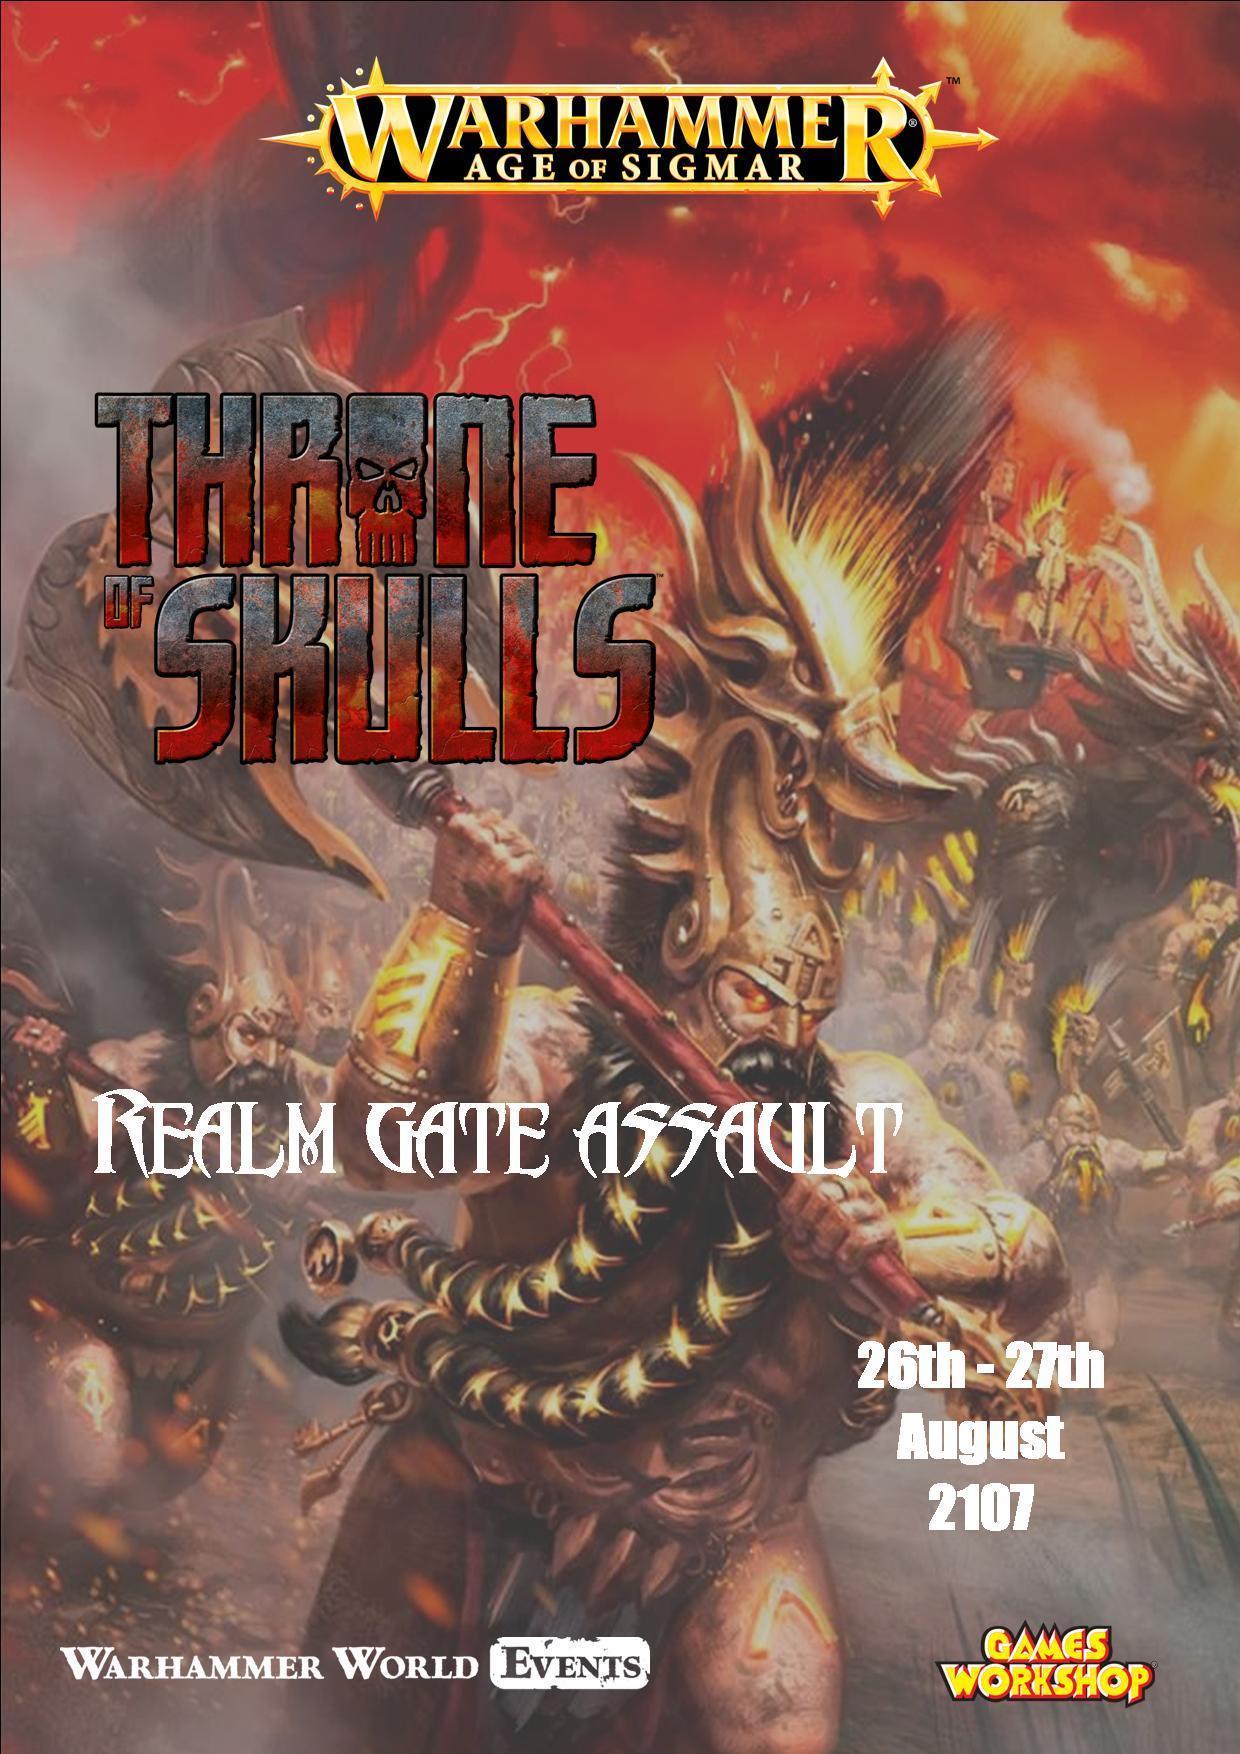 Warhammer Age of Sigmar Throne of Skulls: Rea